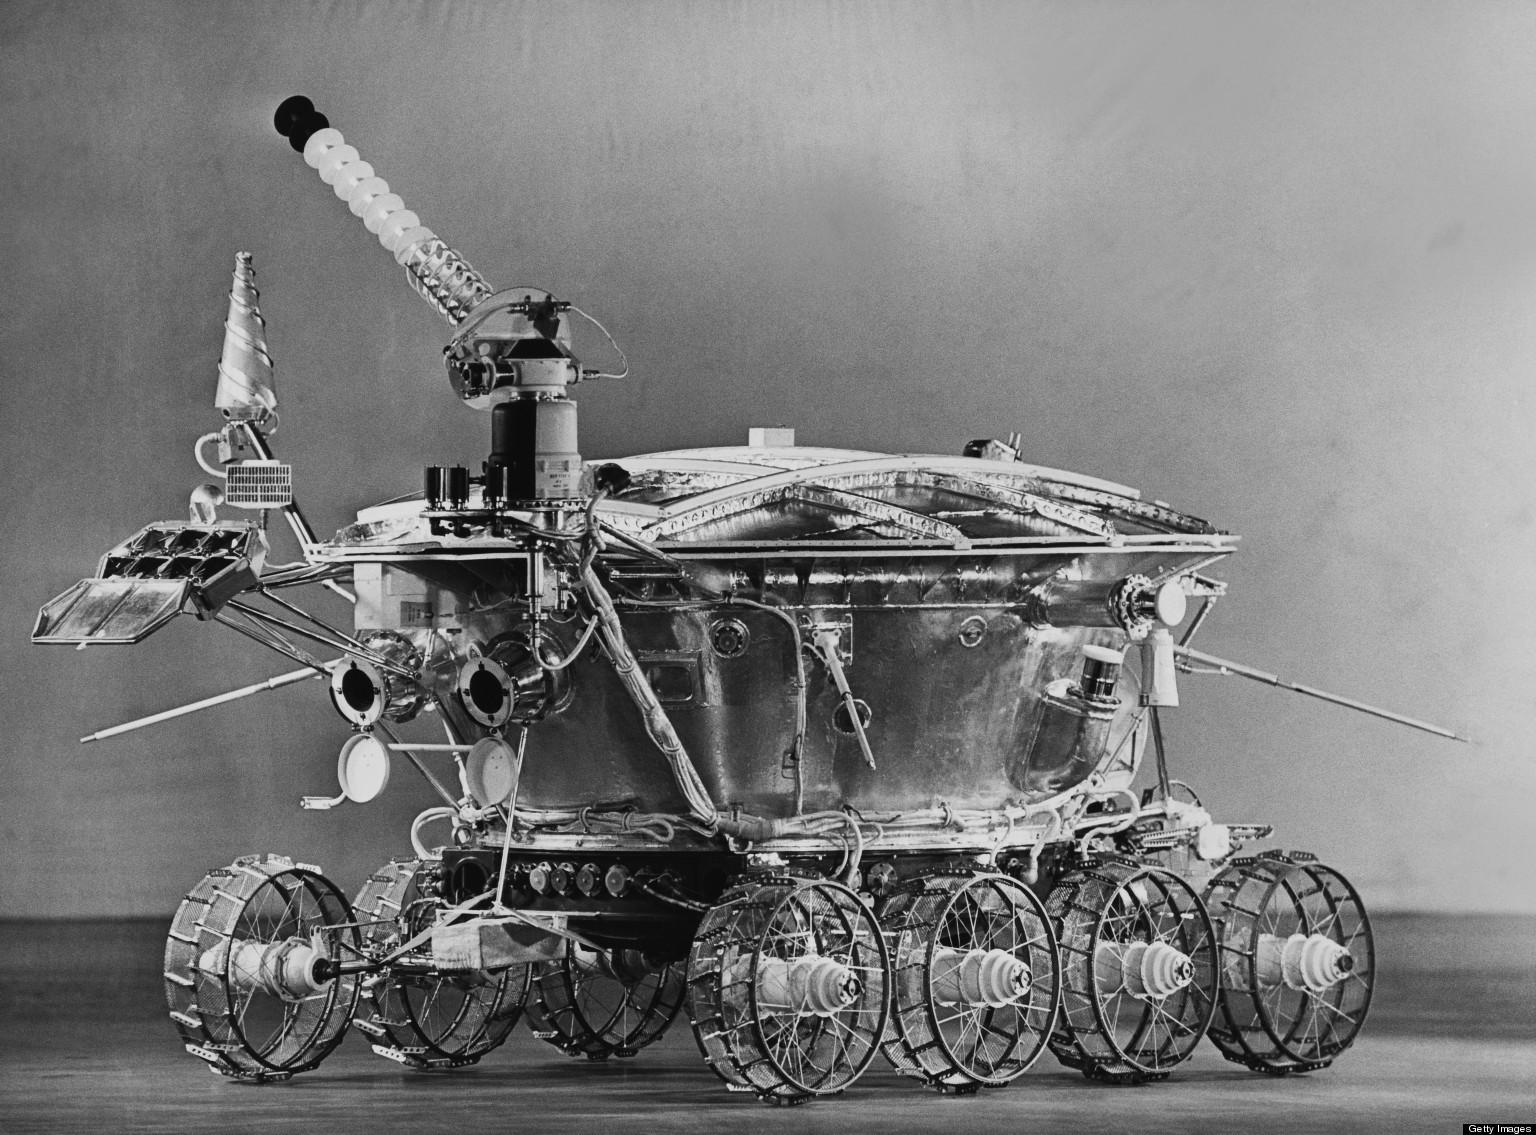 Lunokhod rover